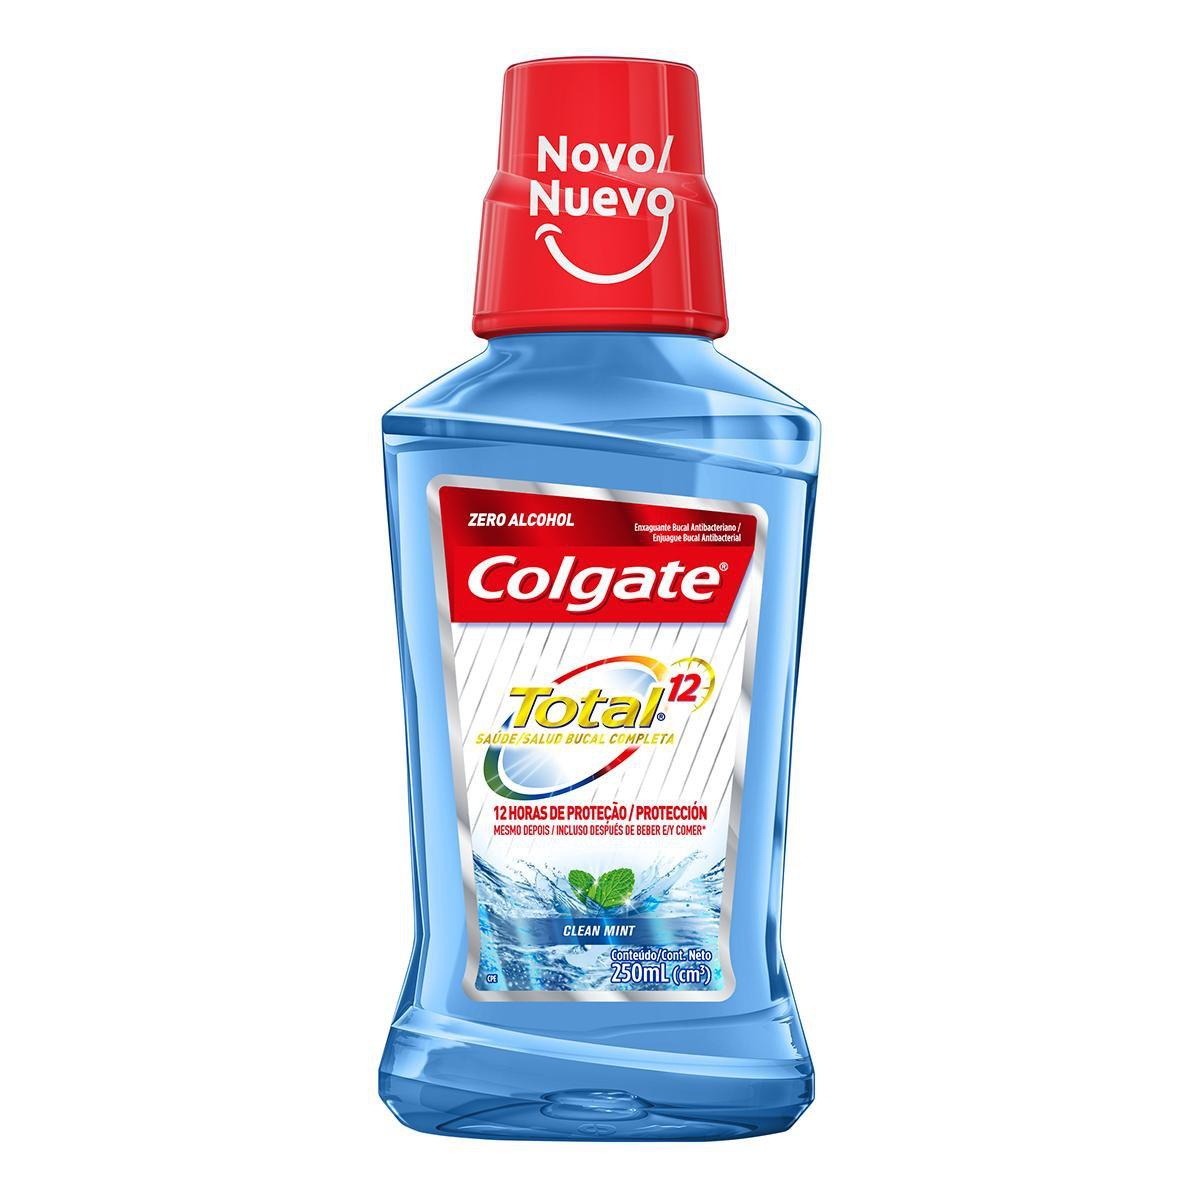 ENXAG COLG TO12 CLEAN MINT 1X250ML(12)